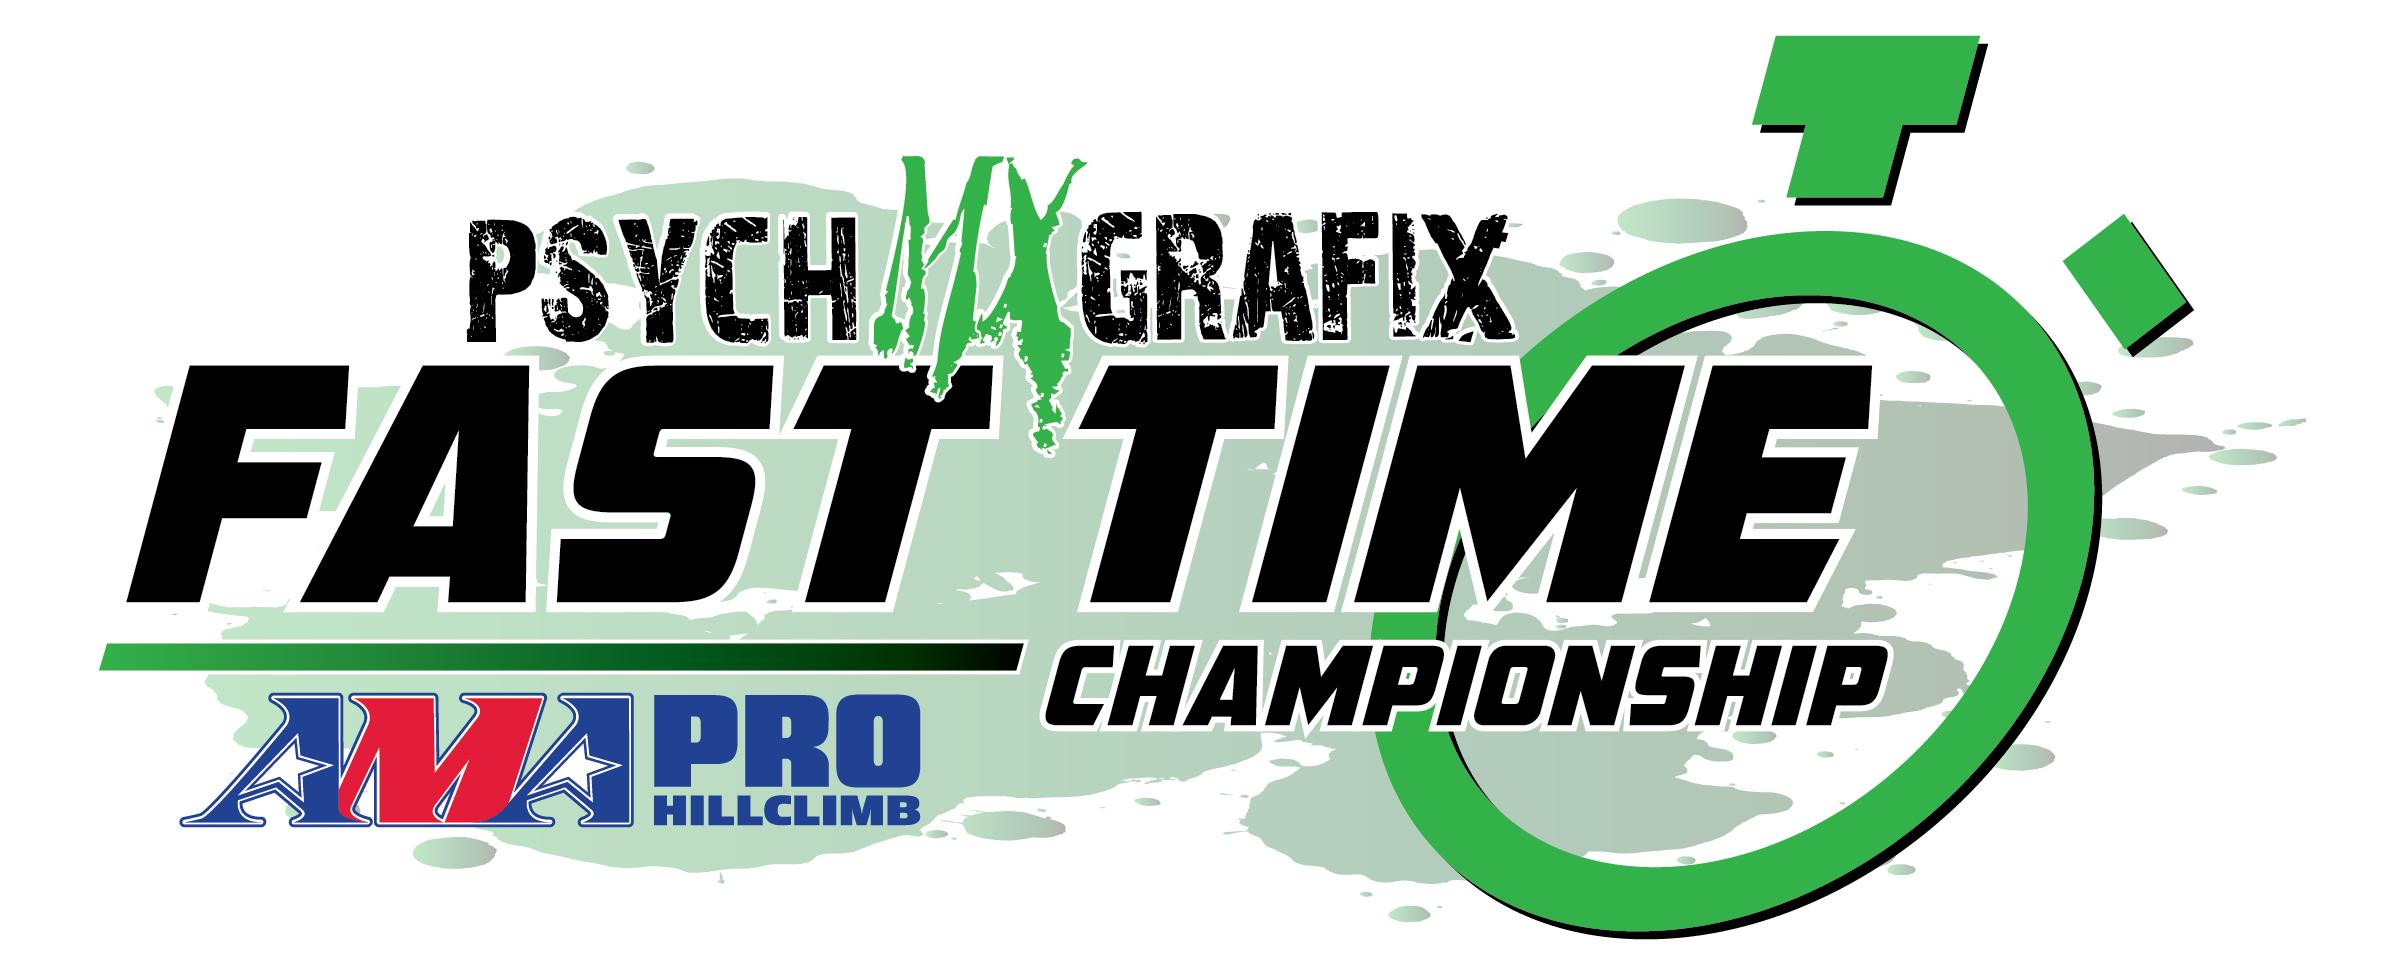 fast-time-championship-logo-01.jpg